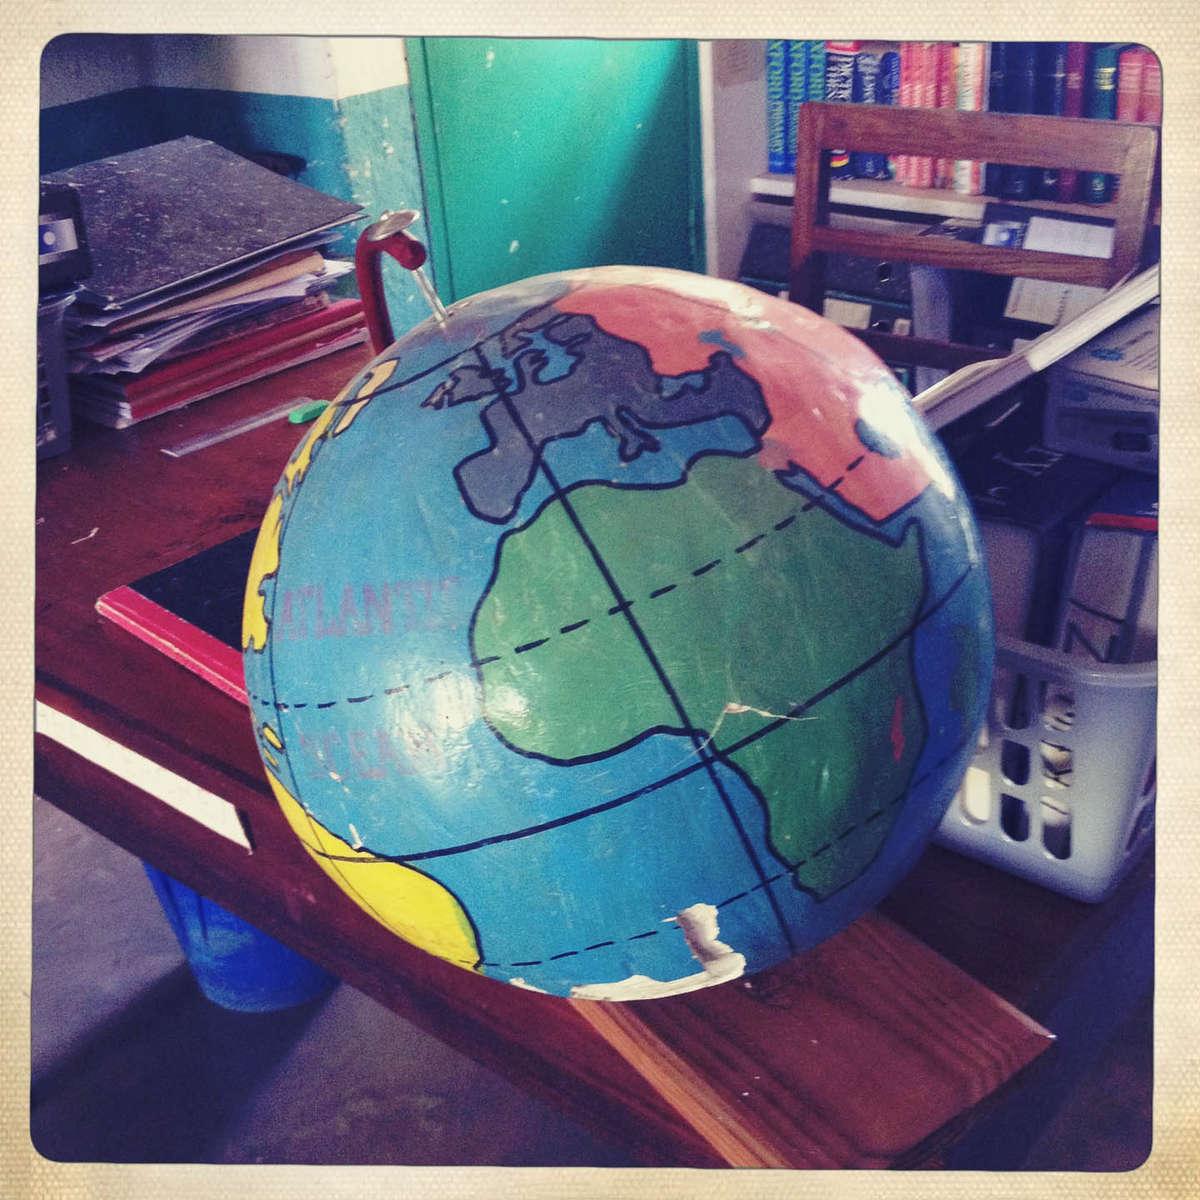 Handmade globe in a classroom in Malawi. May 2013.